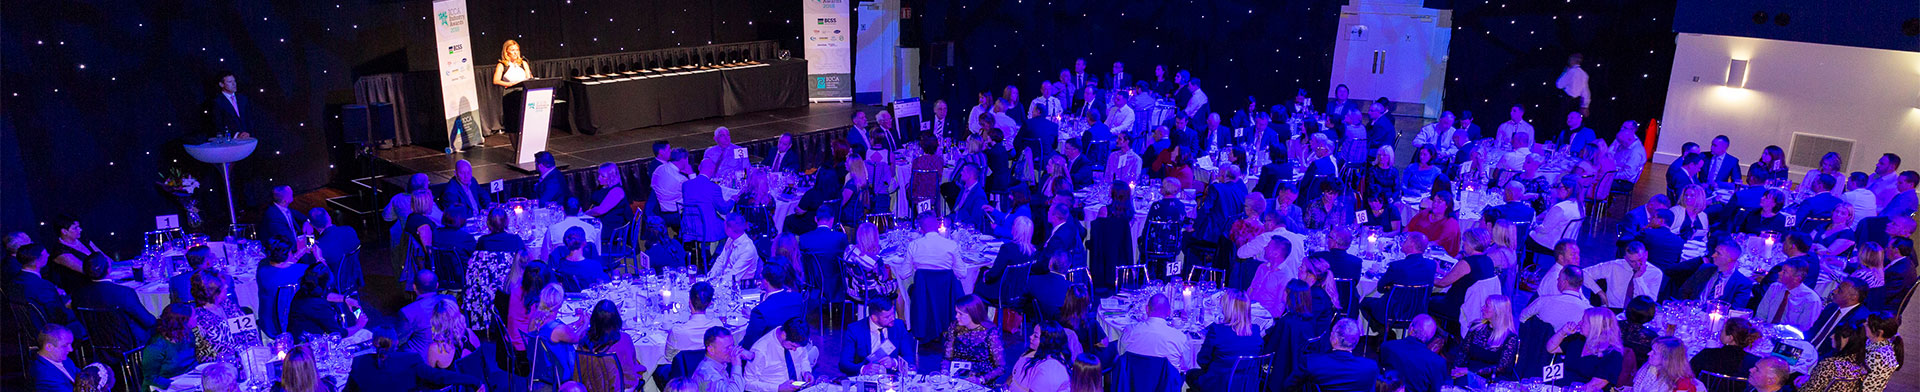 ICCA Awards 2018